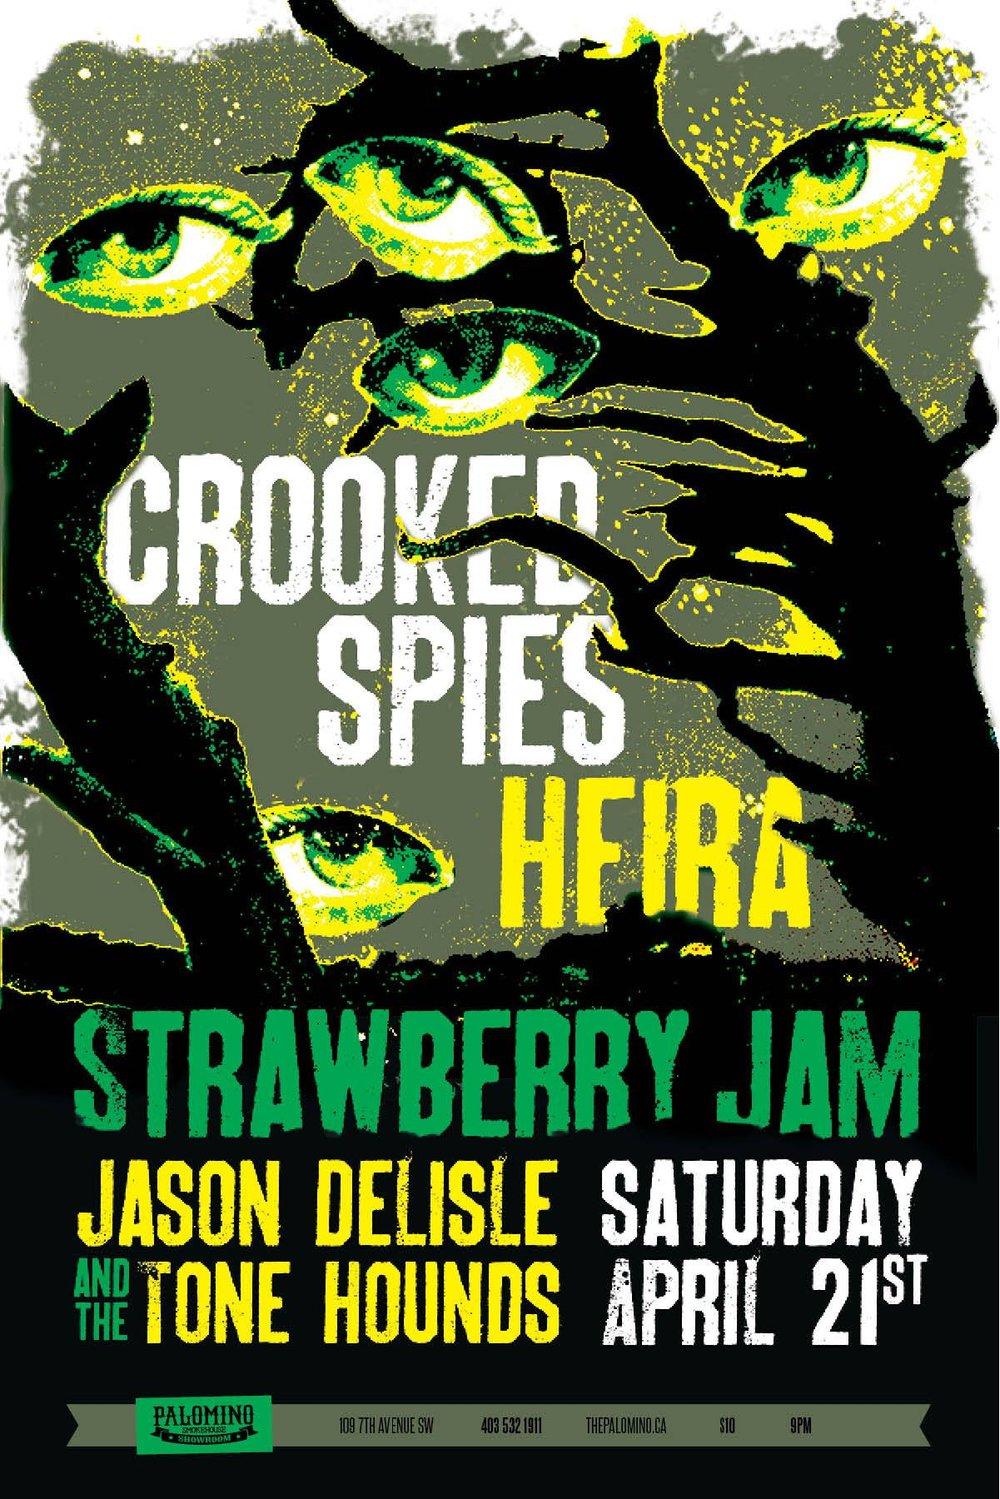 Saturday, April 21 @ Palomino Smokehouse, Calgary, AB w/ Heira, Strawberry Jam & Jason Delisle and the Tone Hounds -